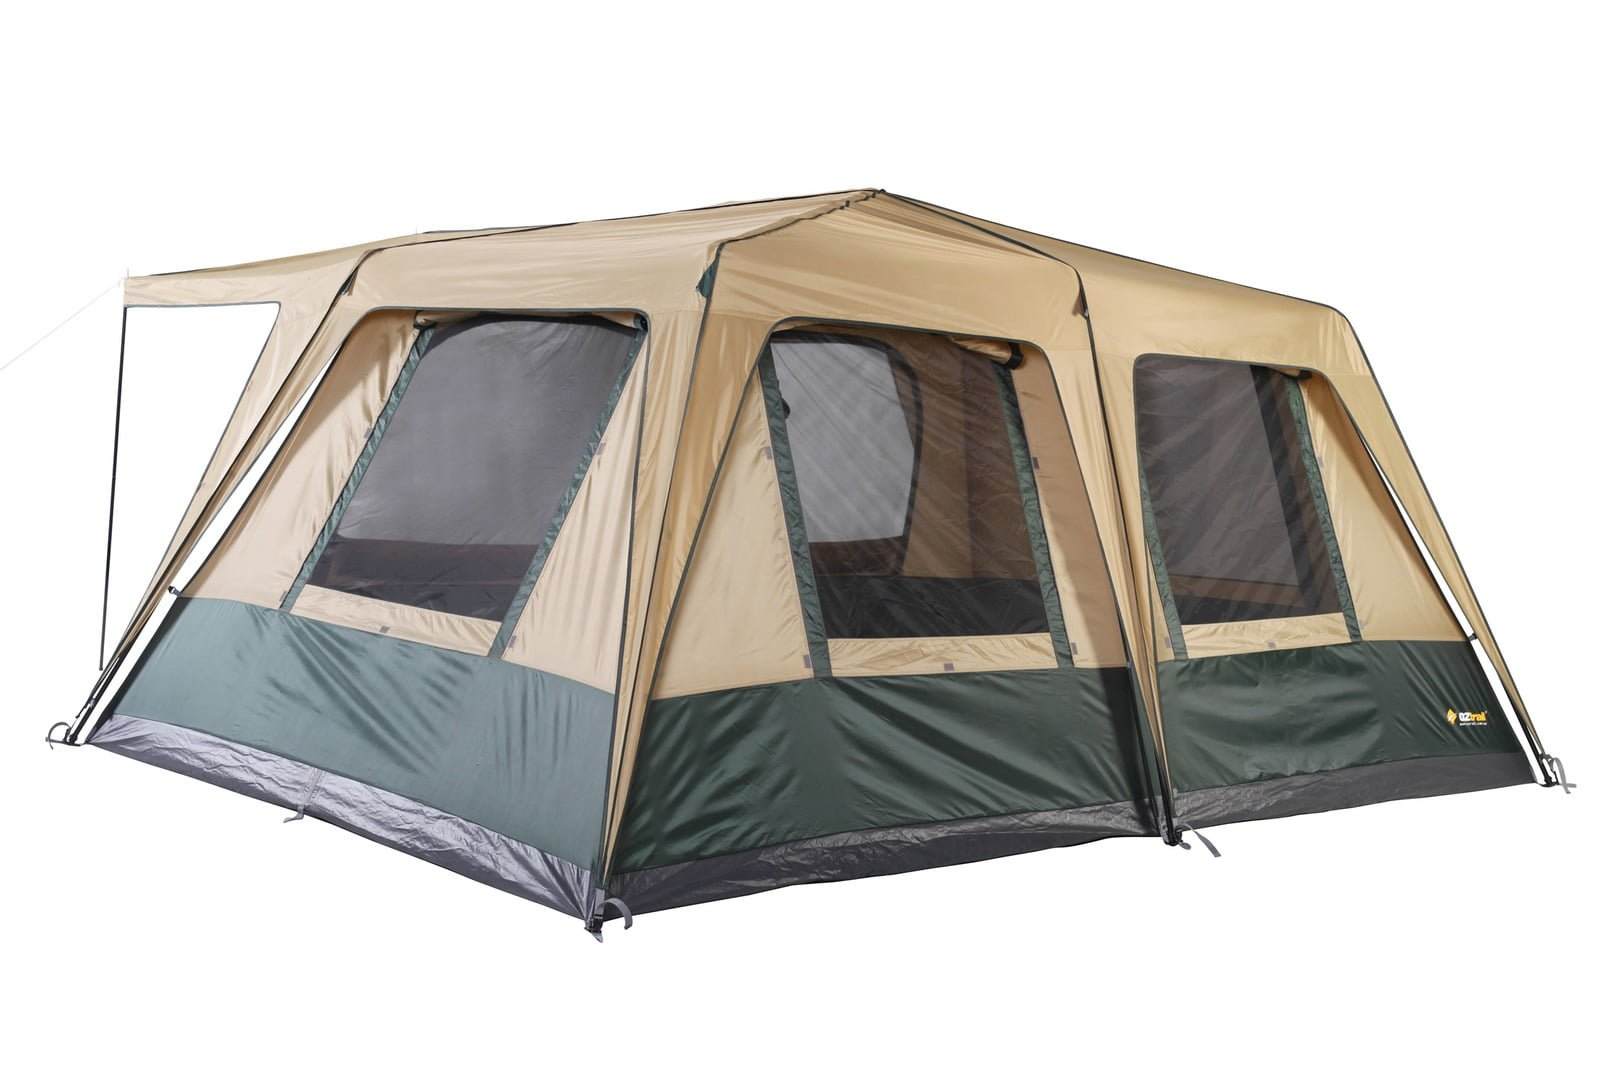 OZtrail Cruiser 450 Cabin Fast Frame Tent side